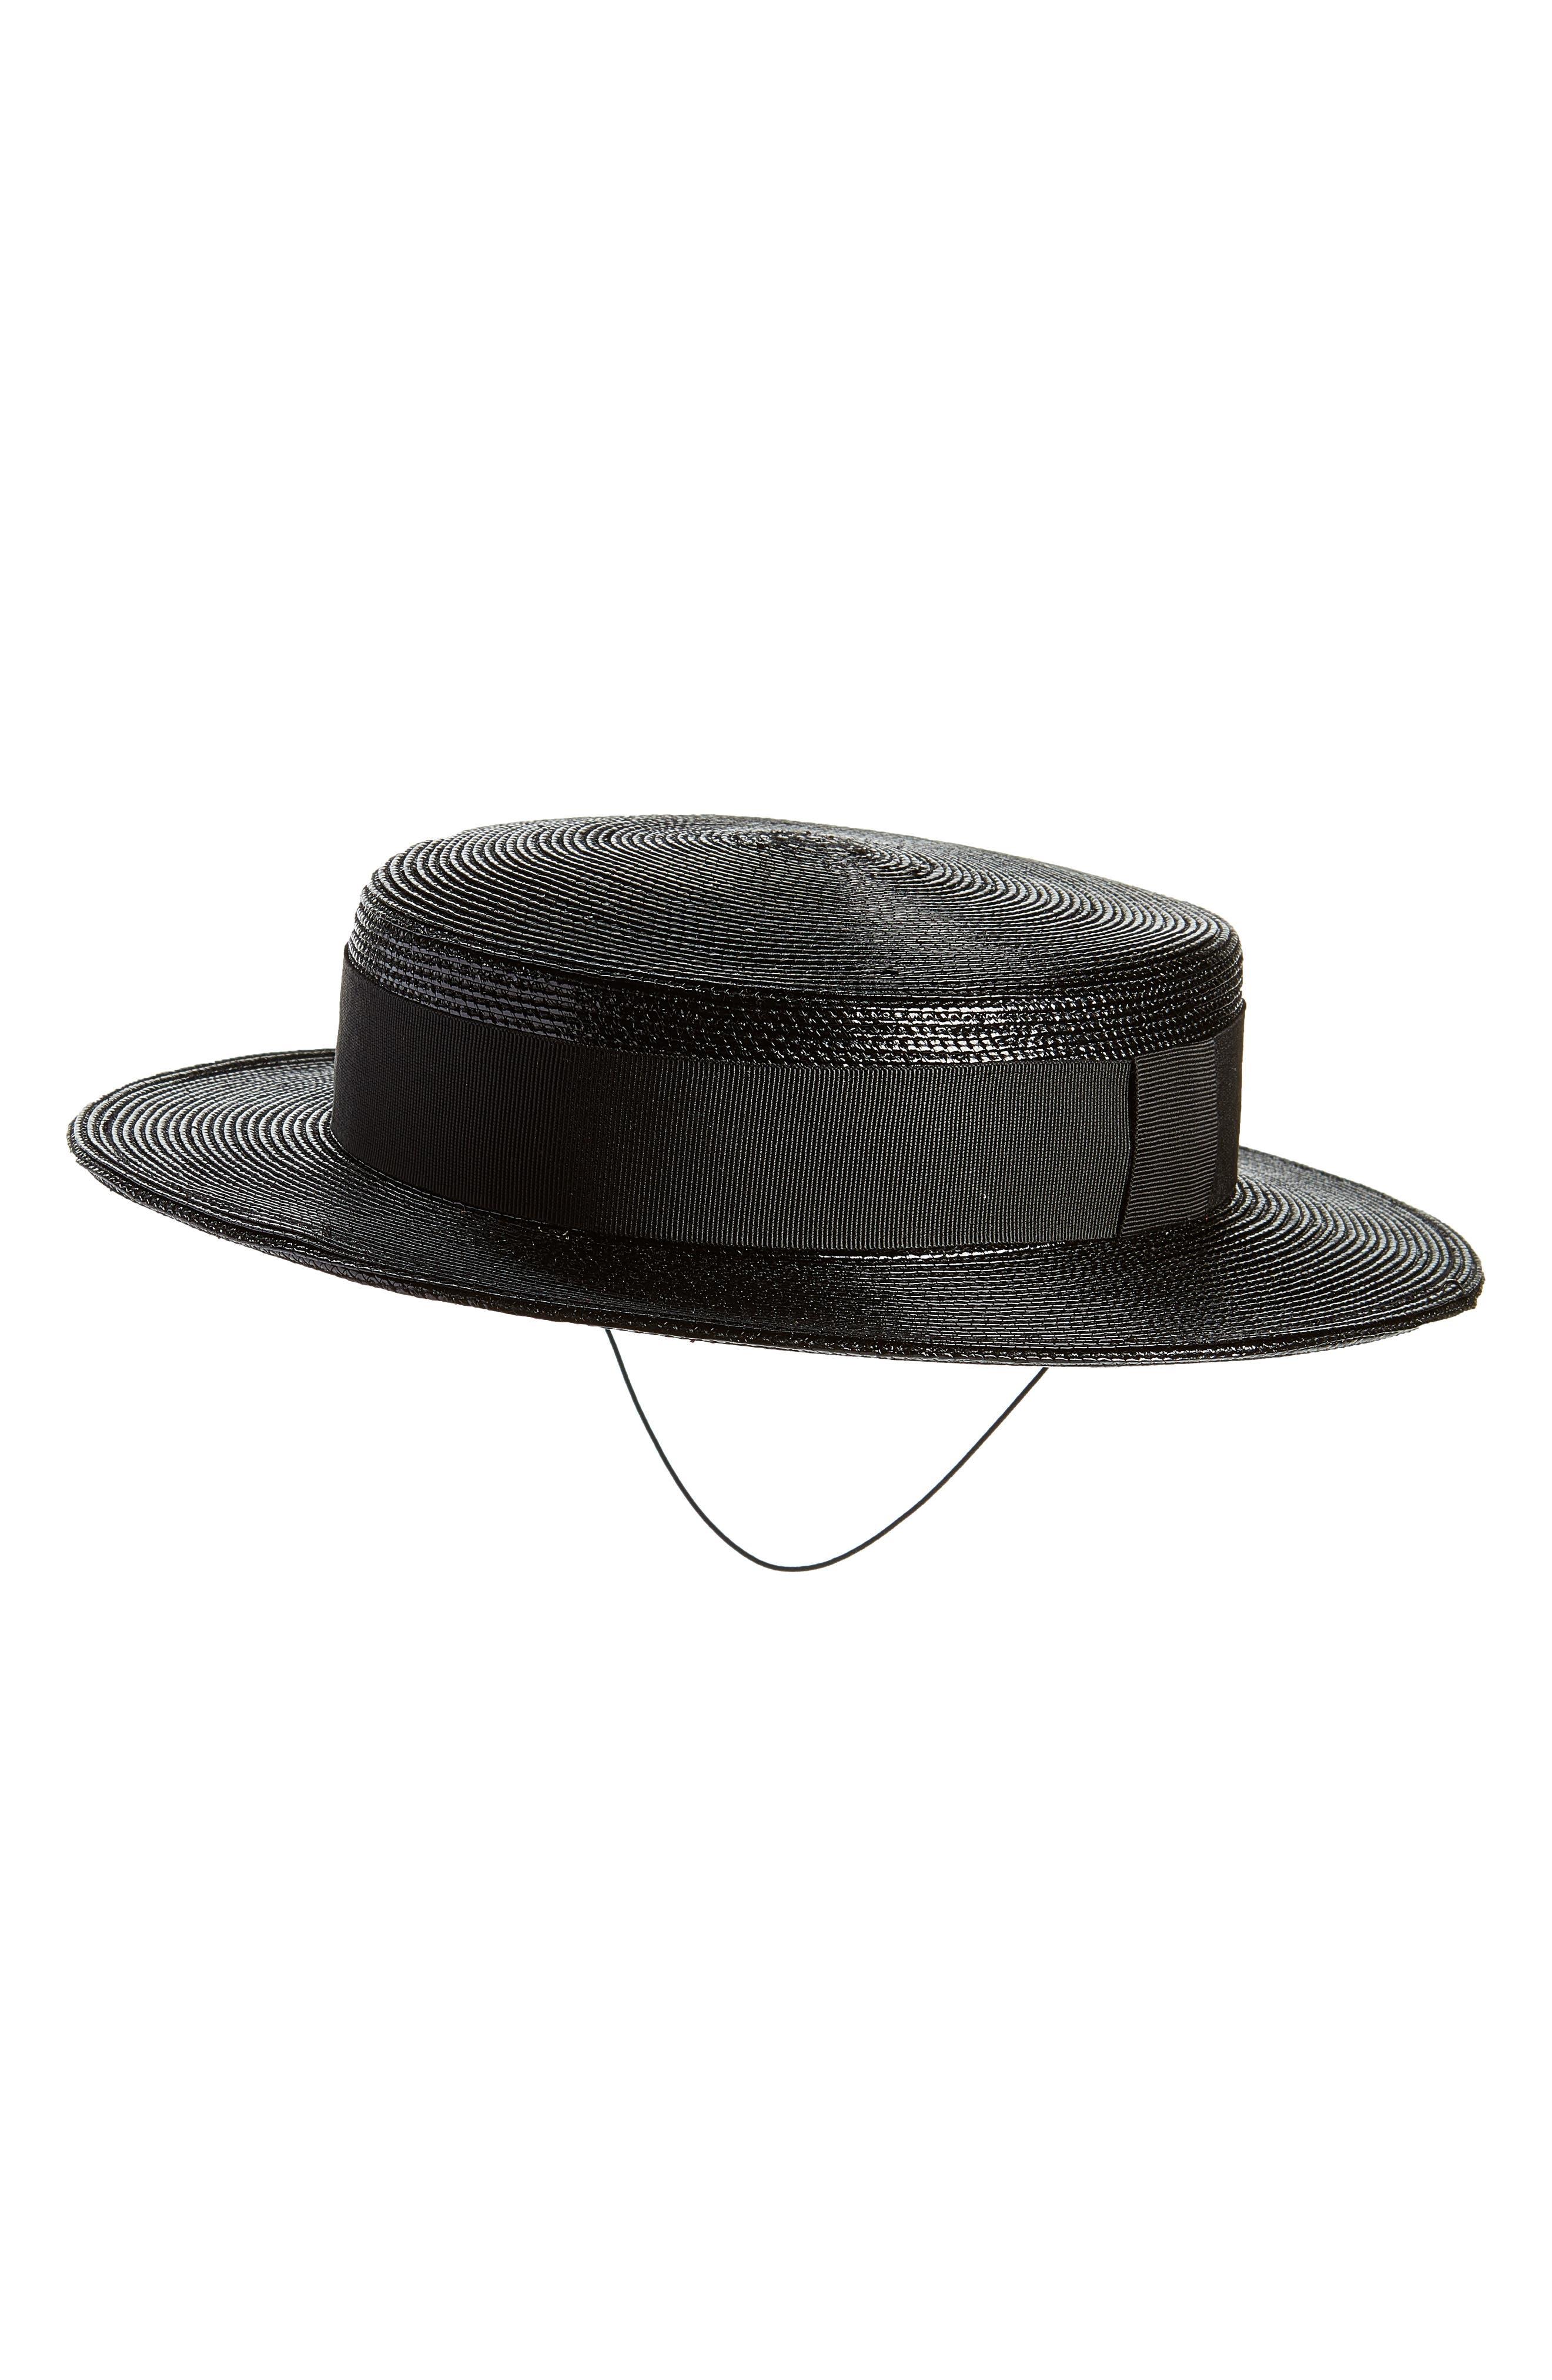 Petite Boater Hat,                         Main,                         color, BLACK